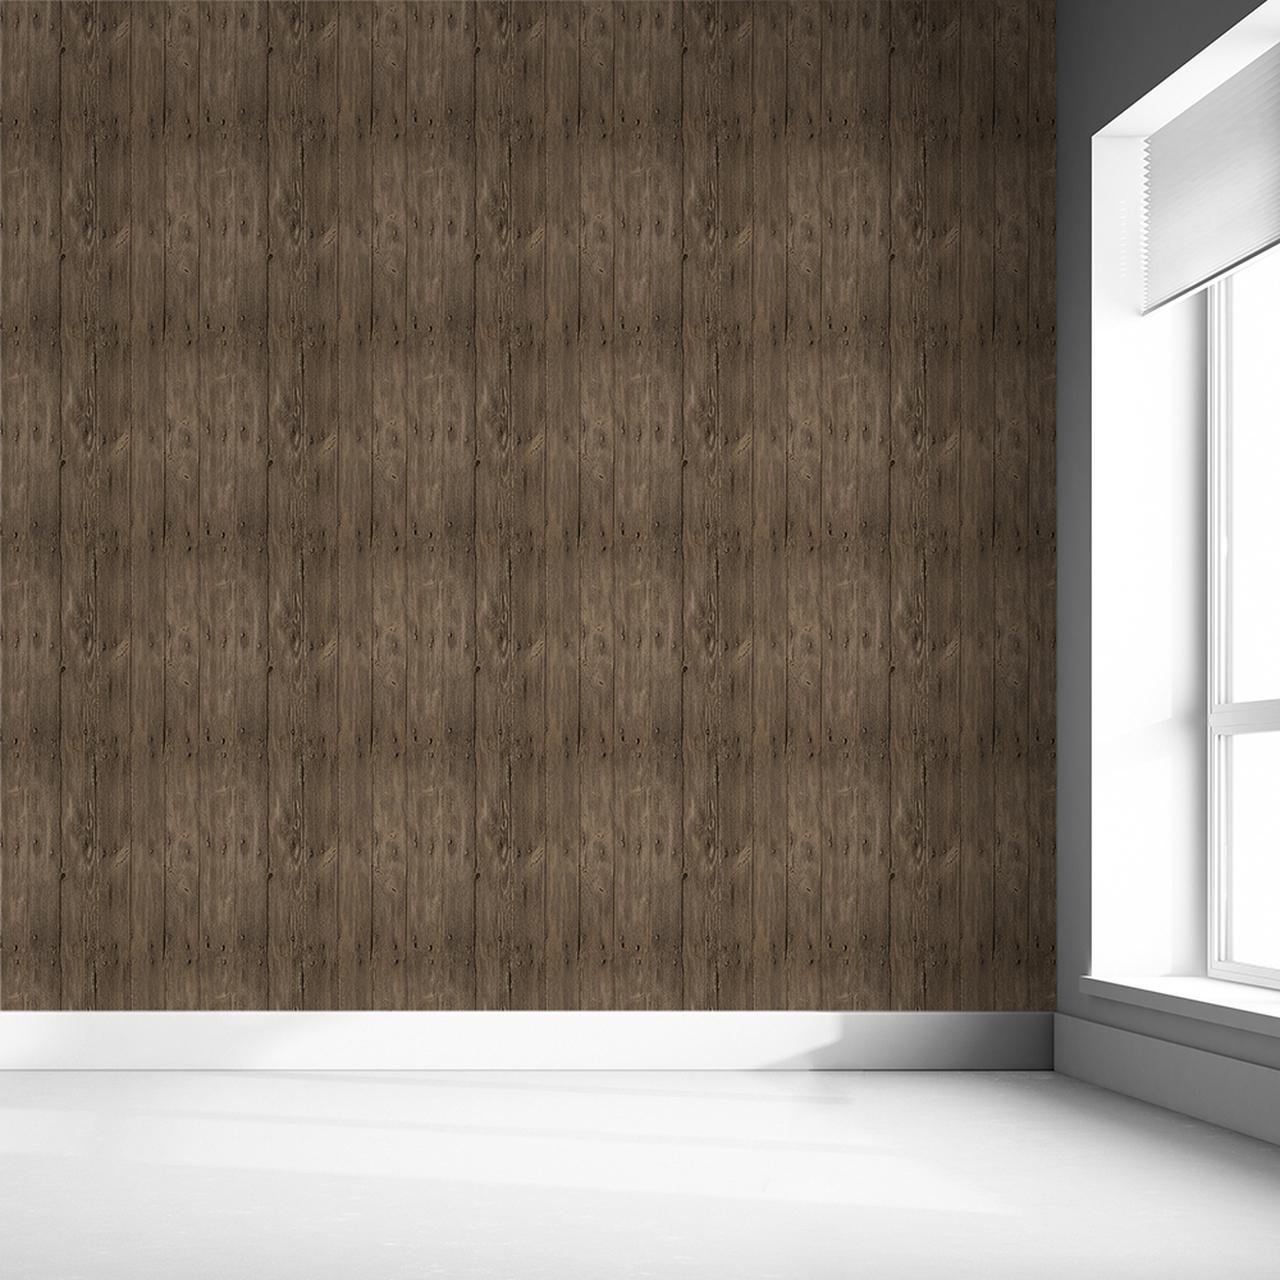 Rustic Wood Effect Panel Wallpaper Brown MINEHEART